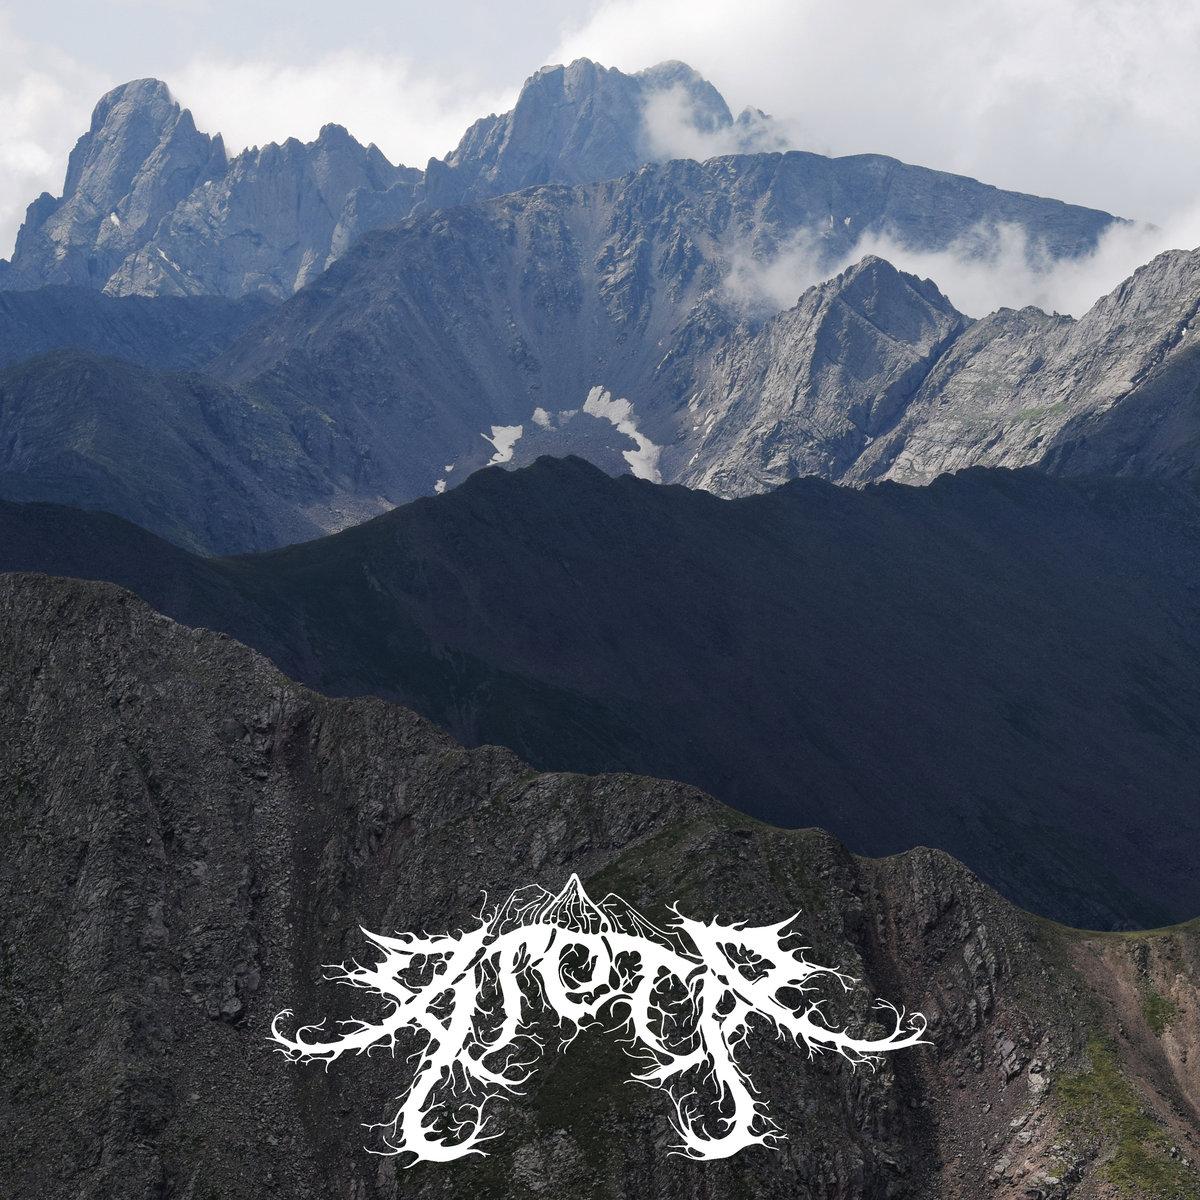 Arête - Hill Giant Hymns